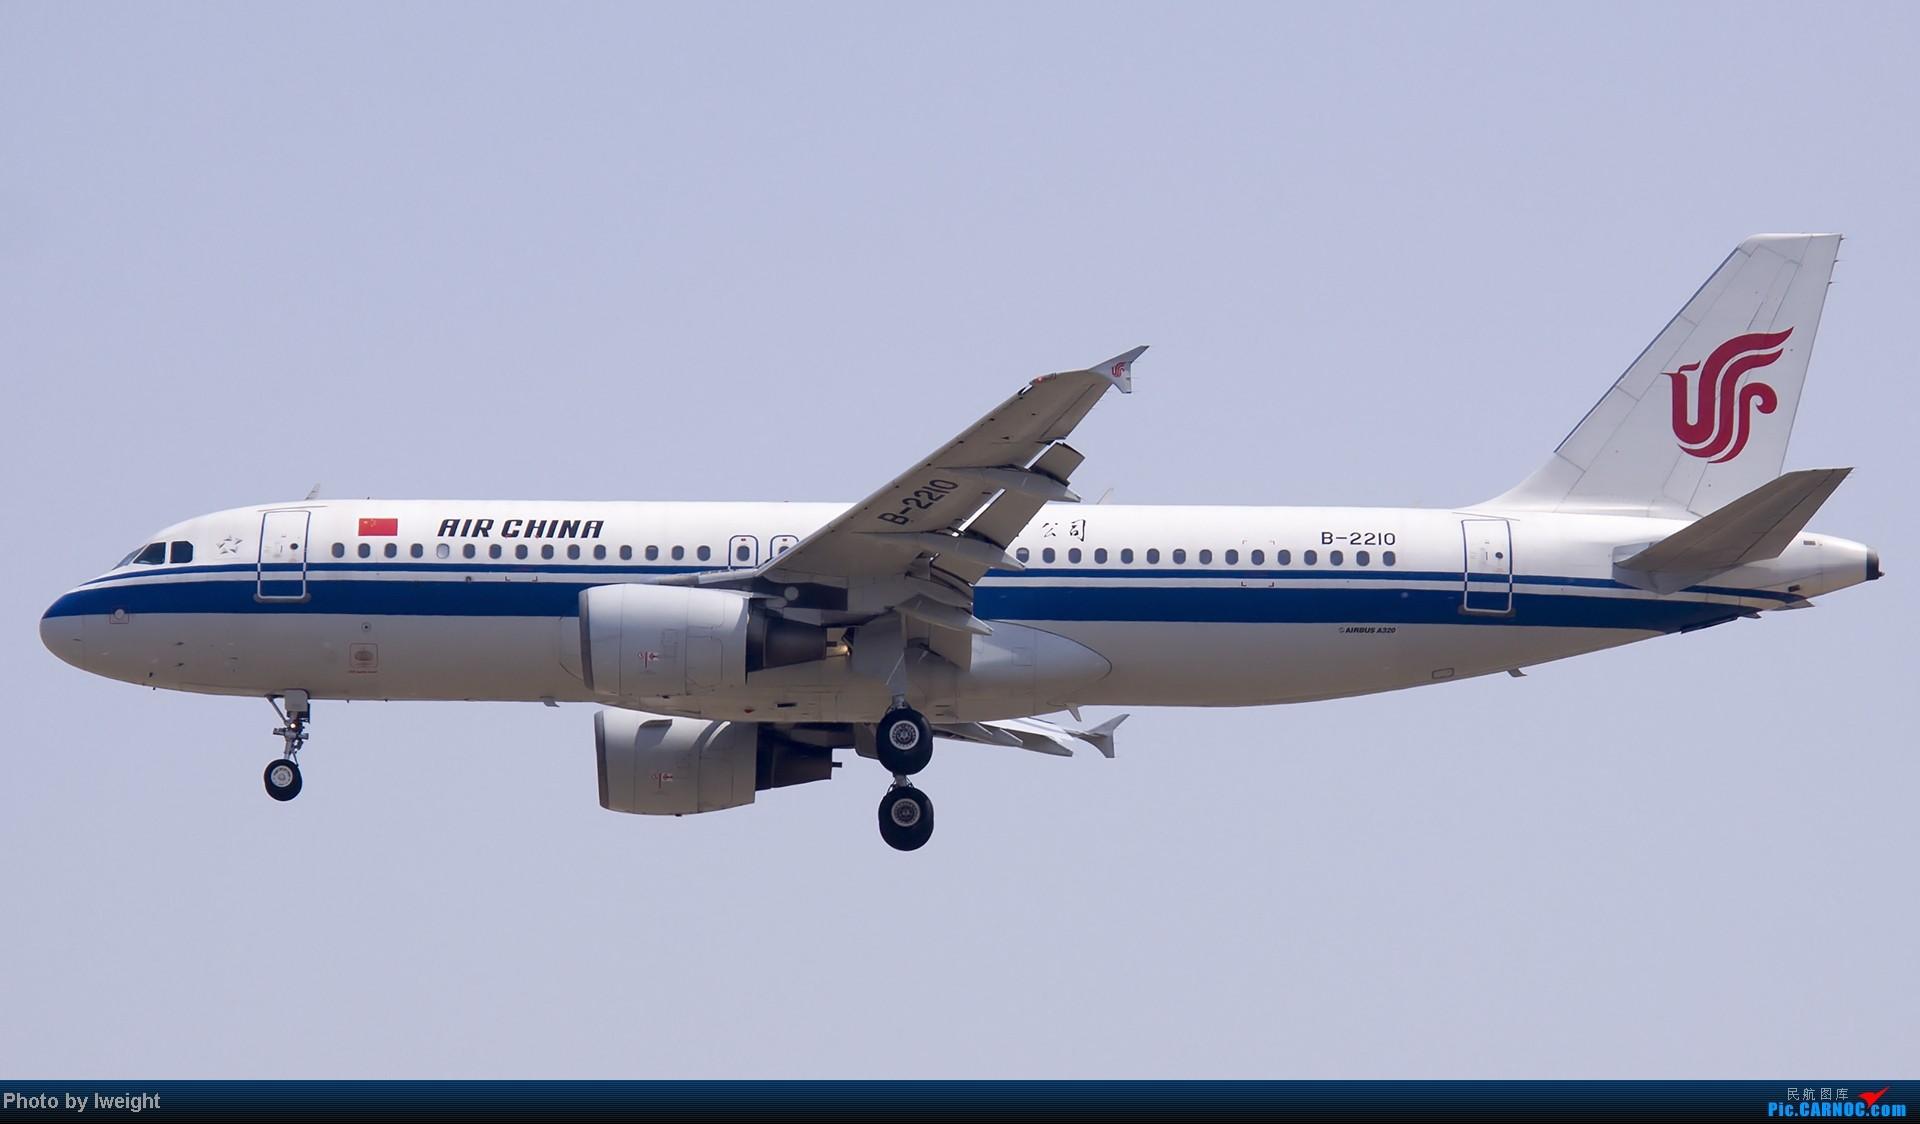 Re:[原创]错过了卡航的巴塞罗那号,只有这些大路货了,泪奔啊 AIRBUS A320-200 B-2210 中国北京首都机场